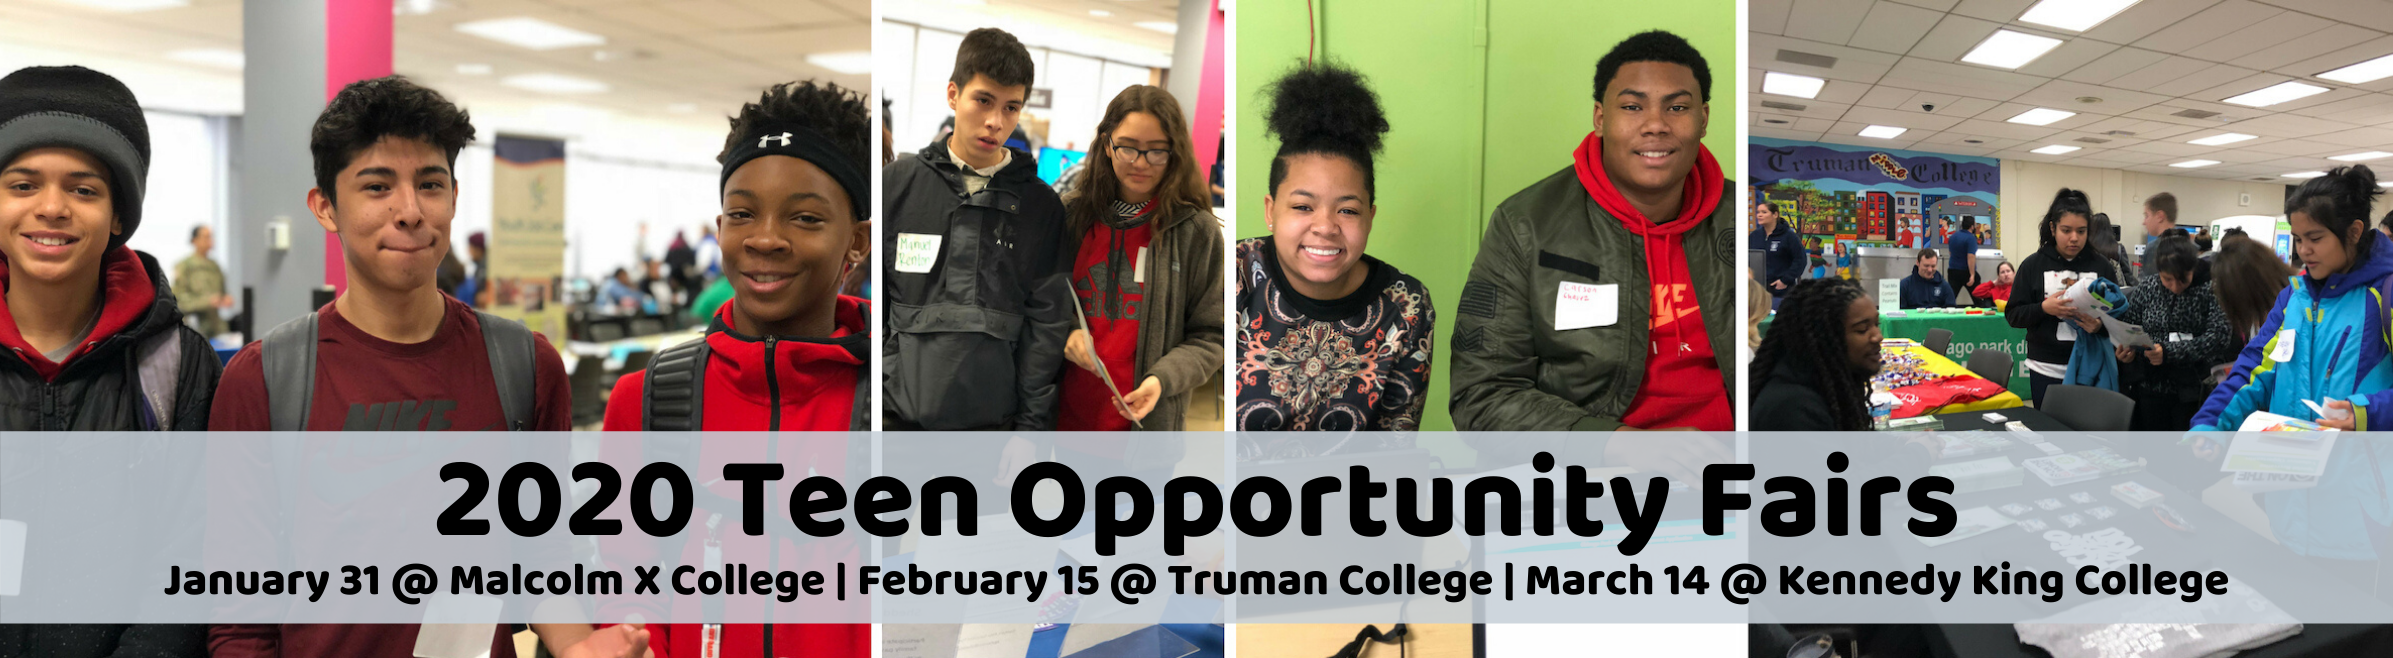 2020 Teen Opportunity Fairs